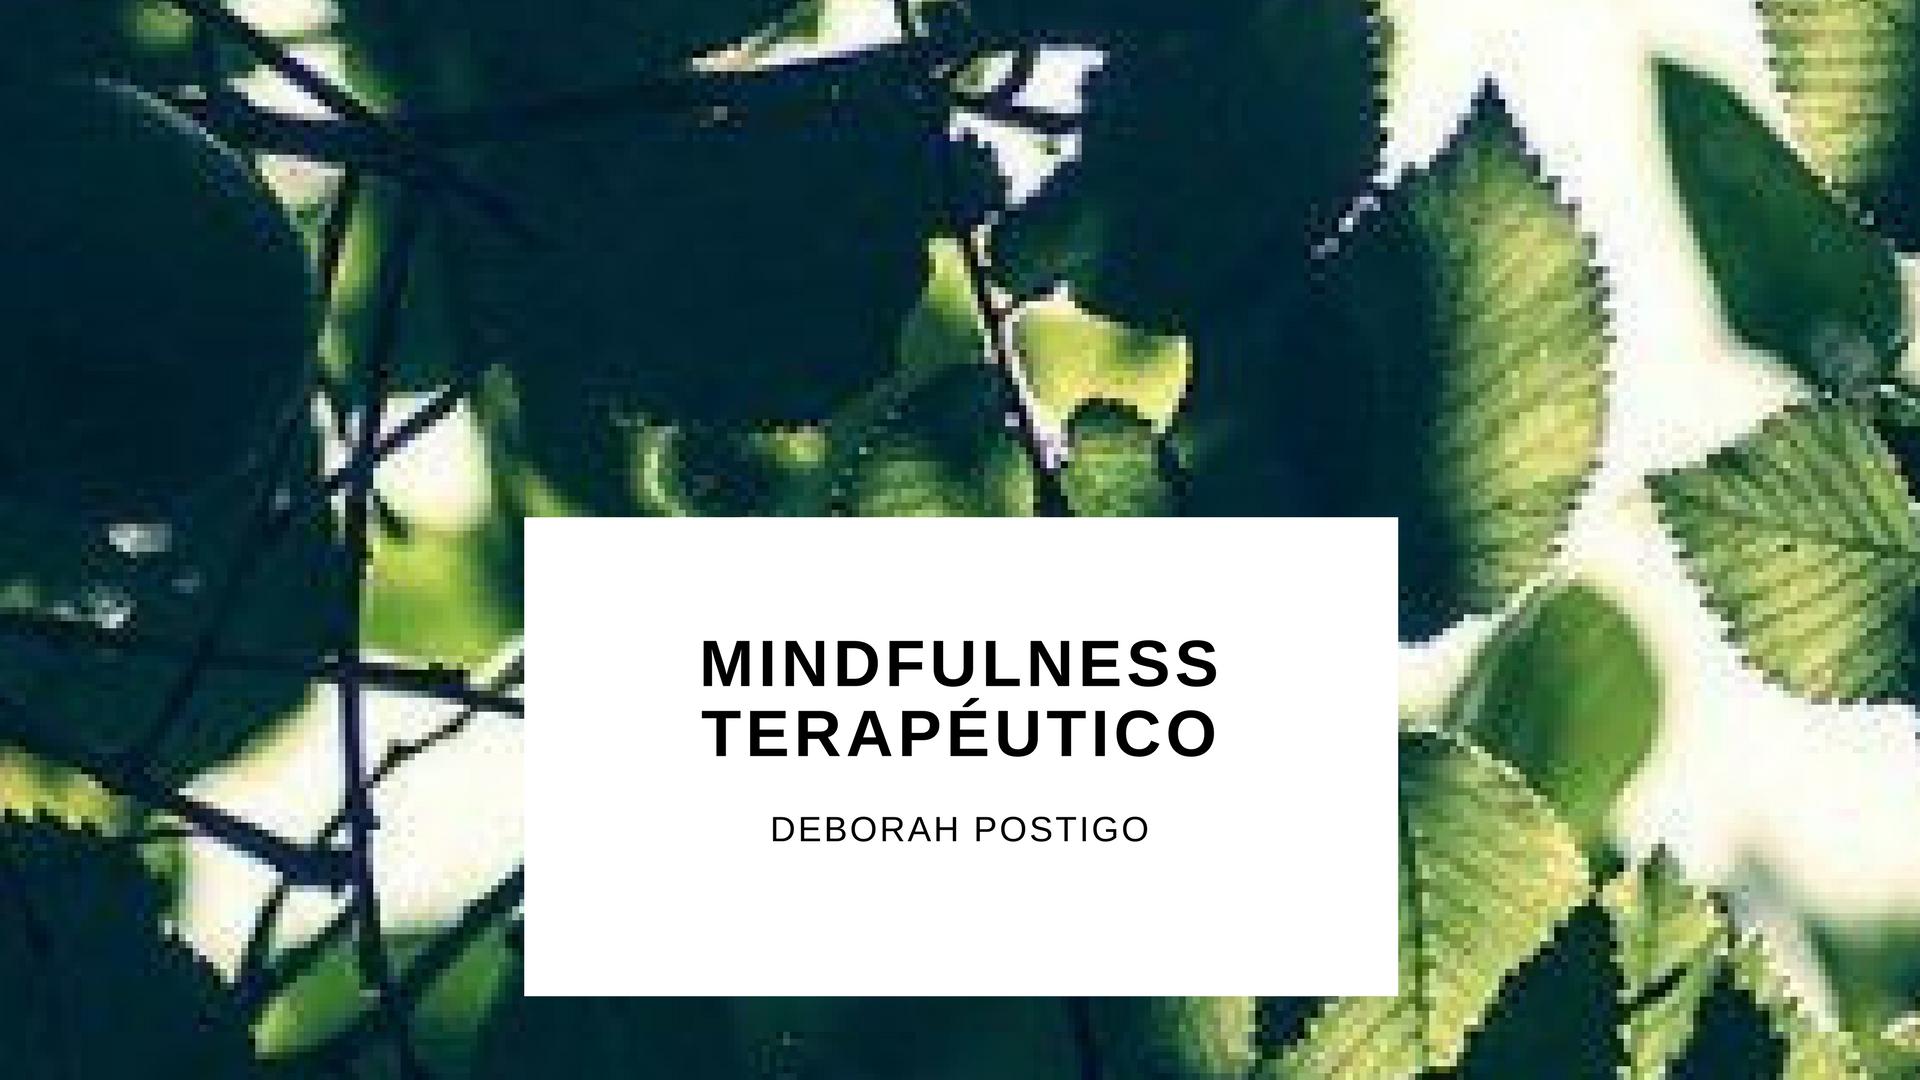 Mindfulness-terapeutico